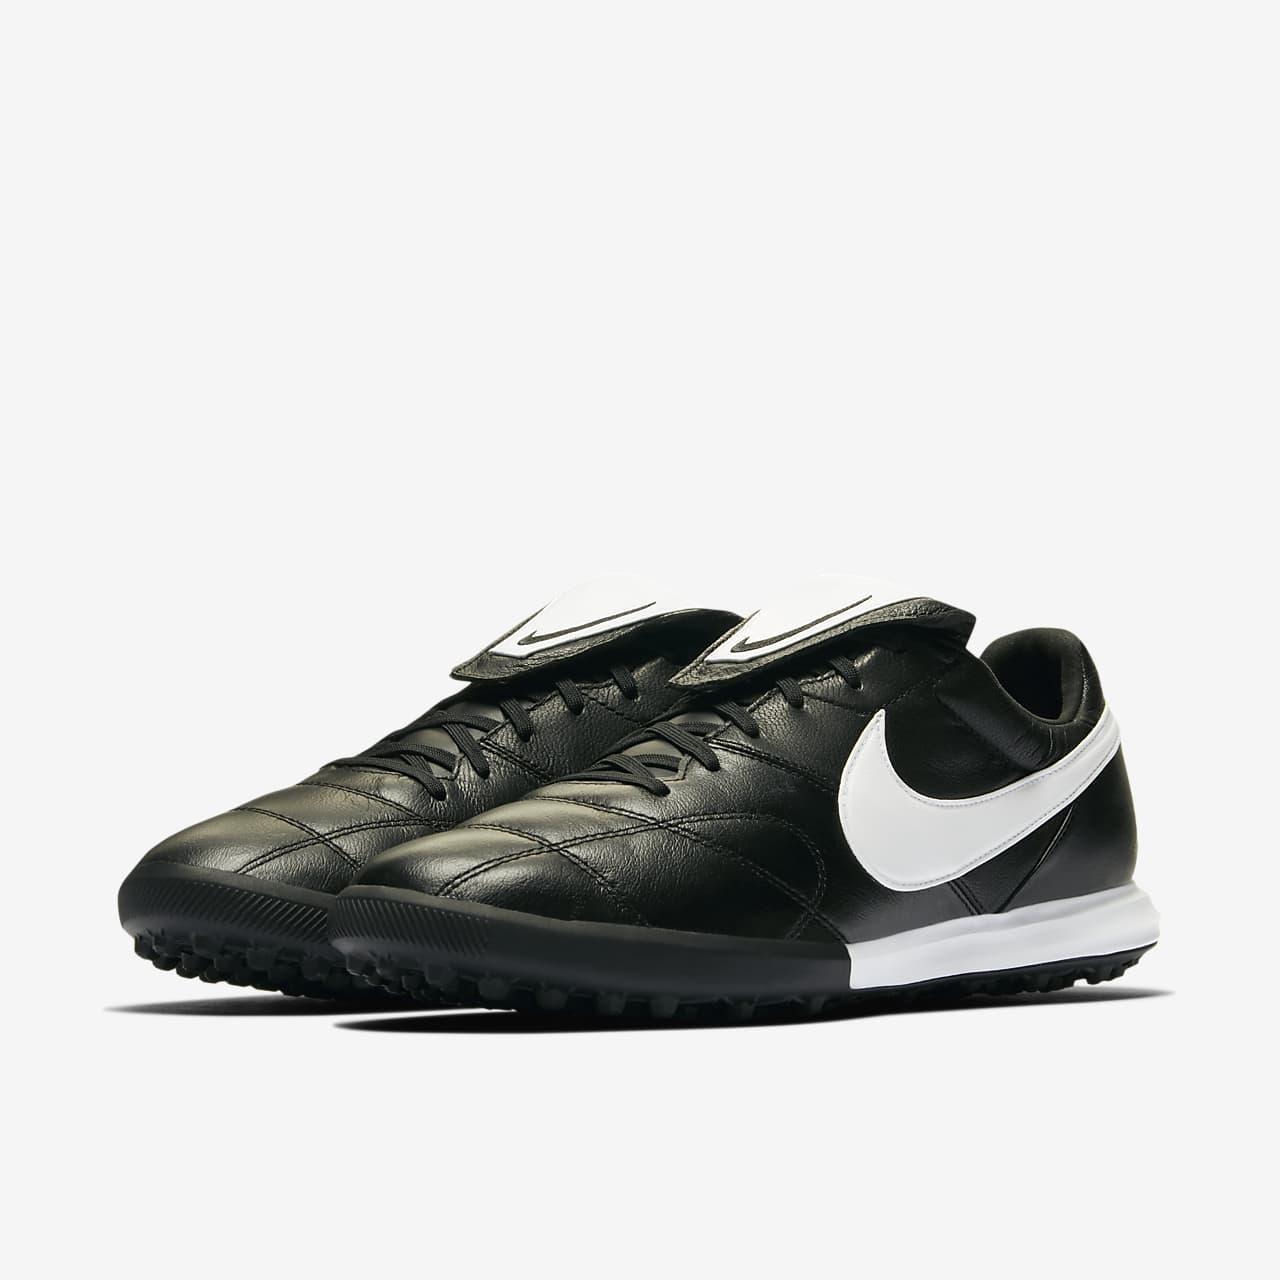 Nike Premier 2 TF Artificial-Turf